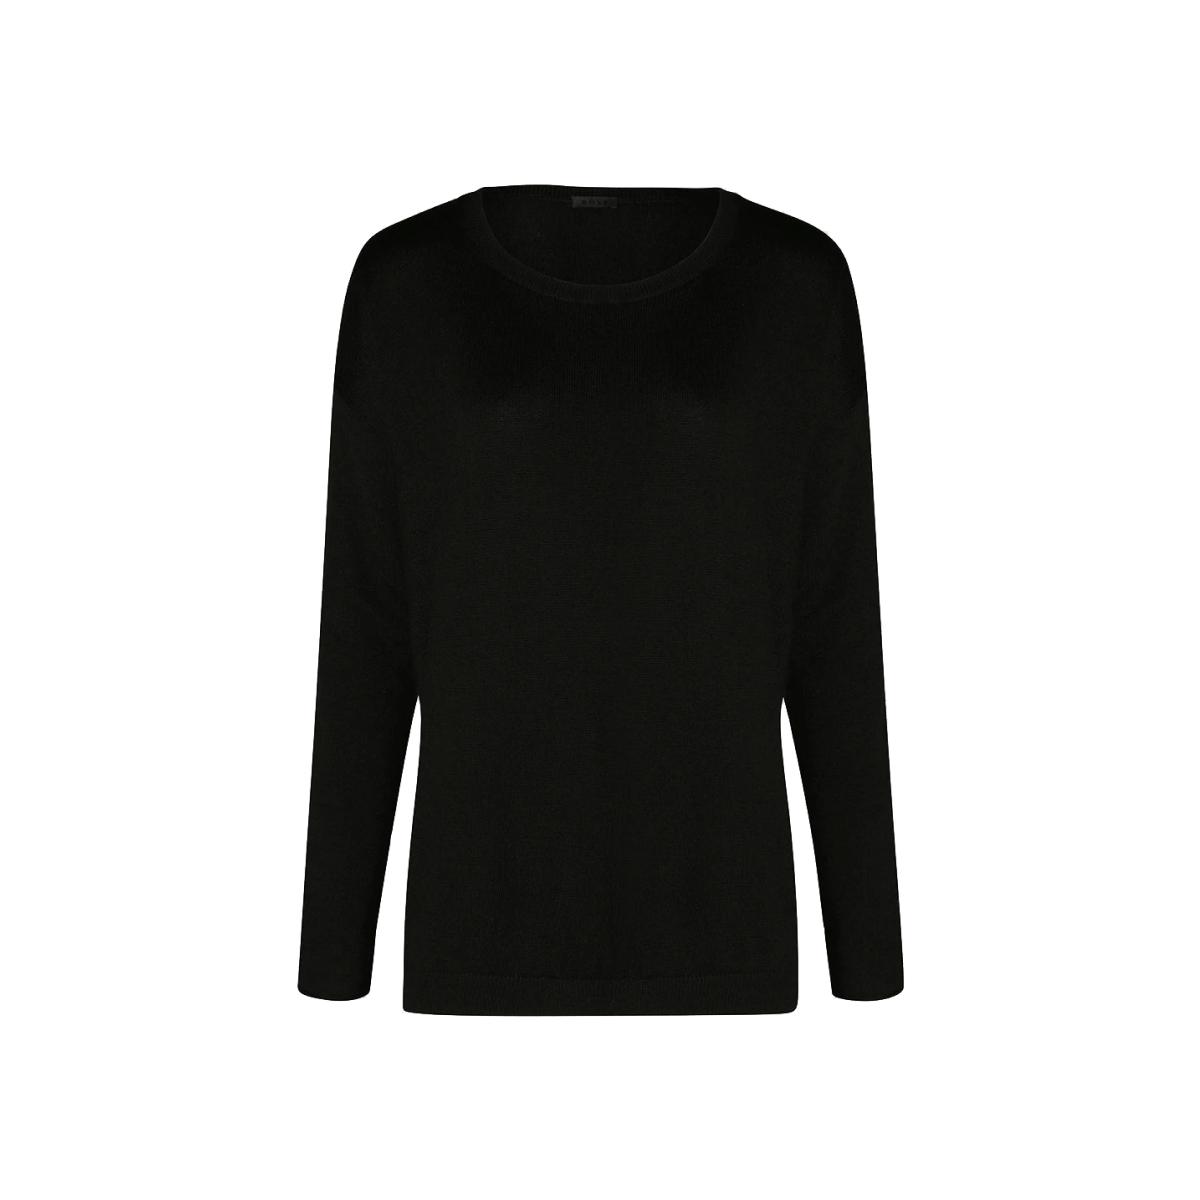 Royl sweater